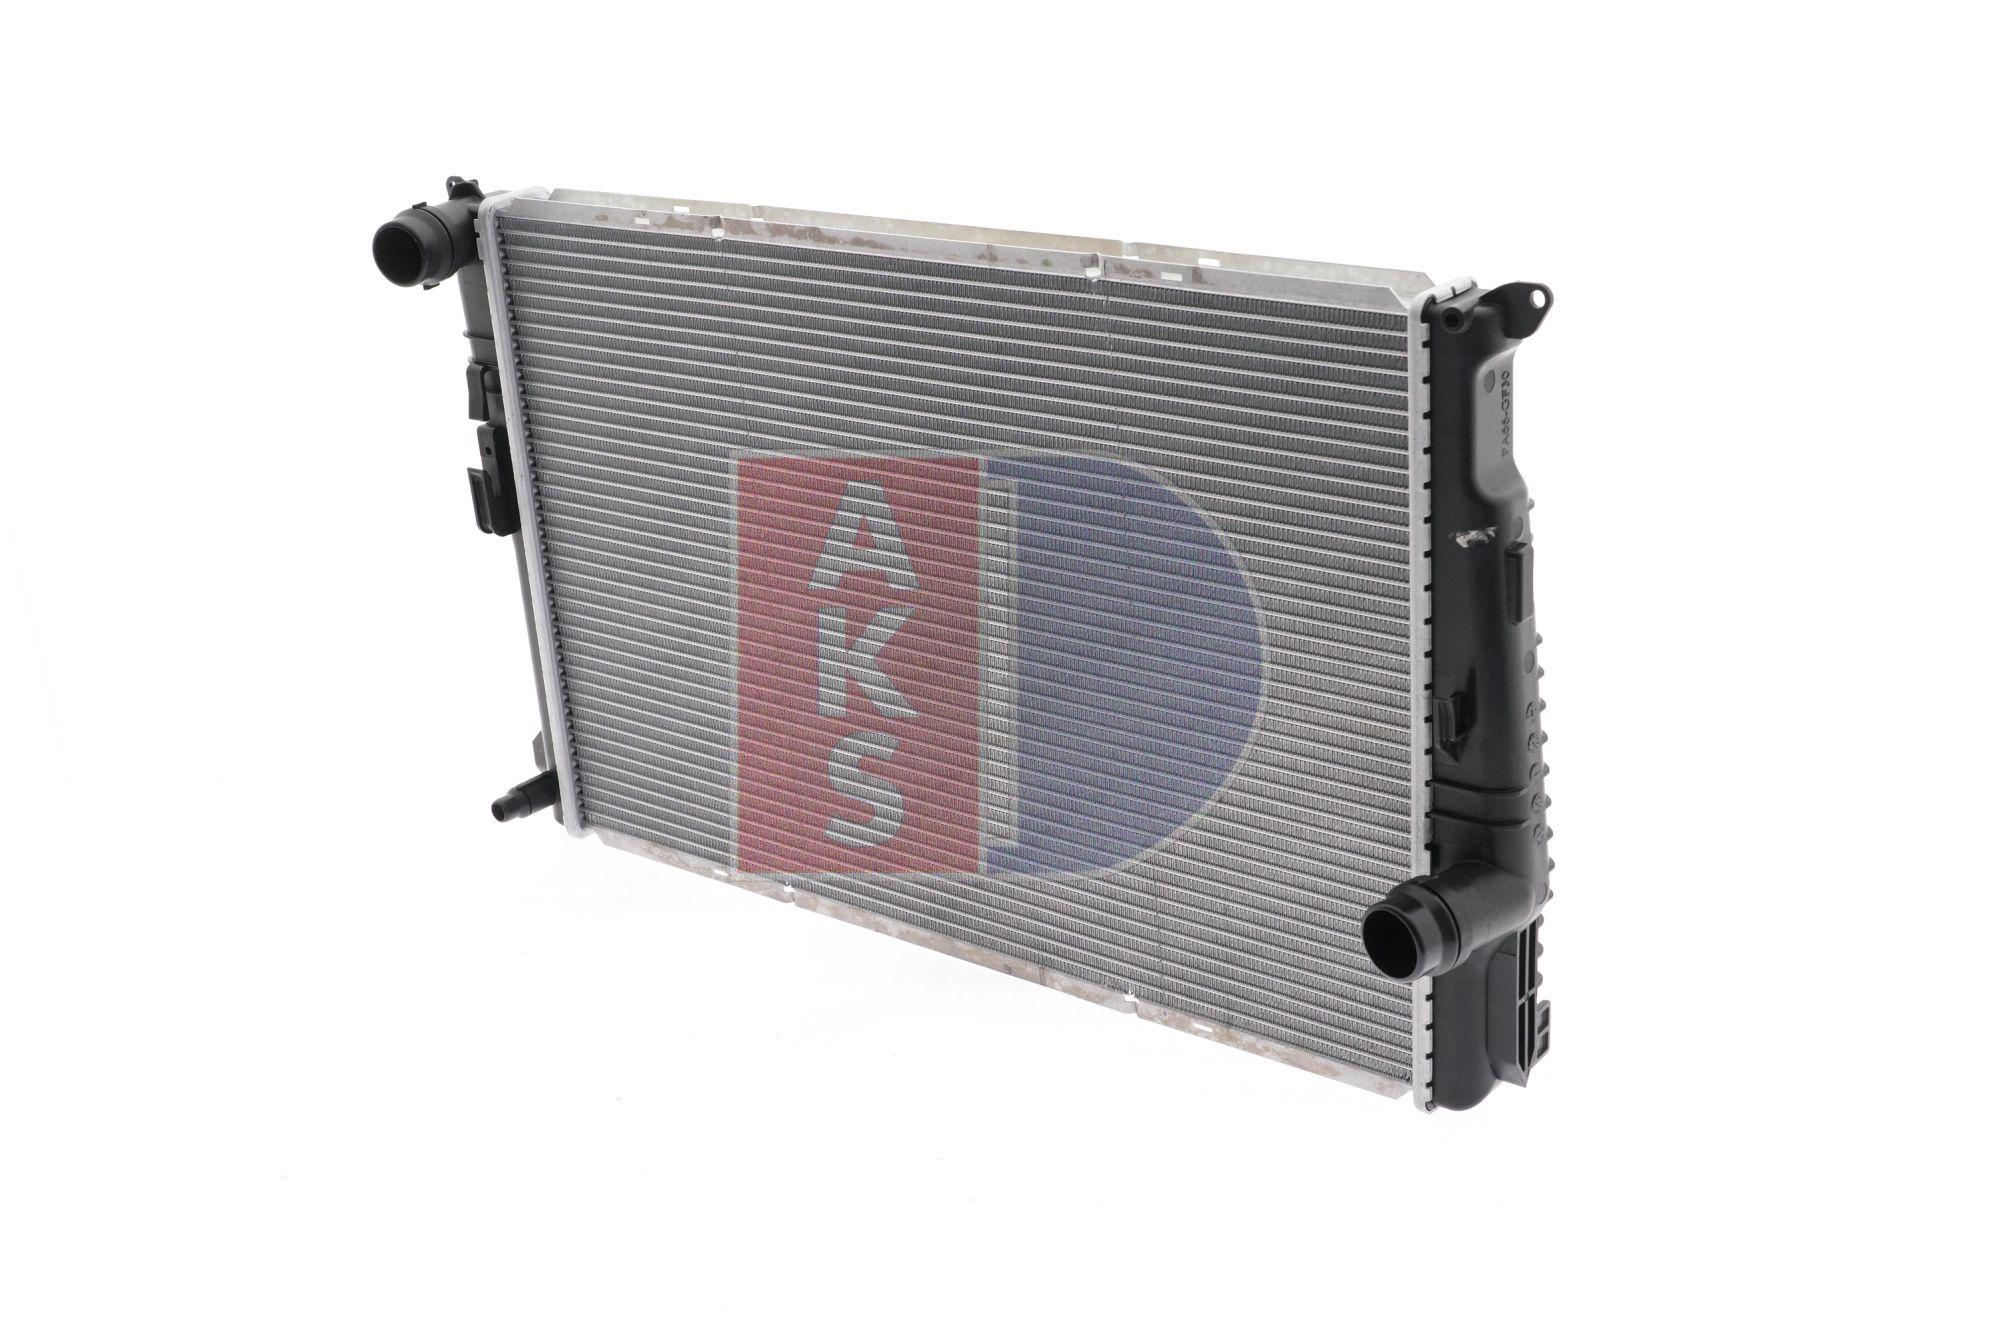 BMW X4 2016 Motorkühler - Original AKS DASIS 050082N Netzmaße: 600x390x32